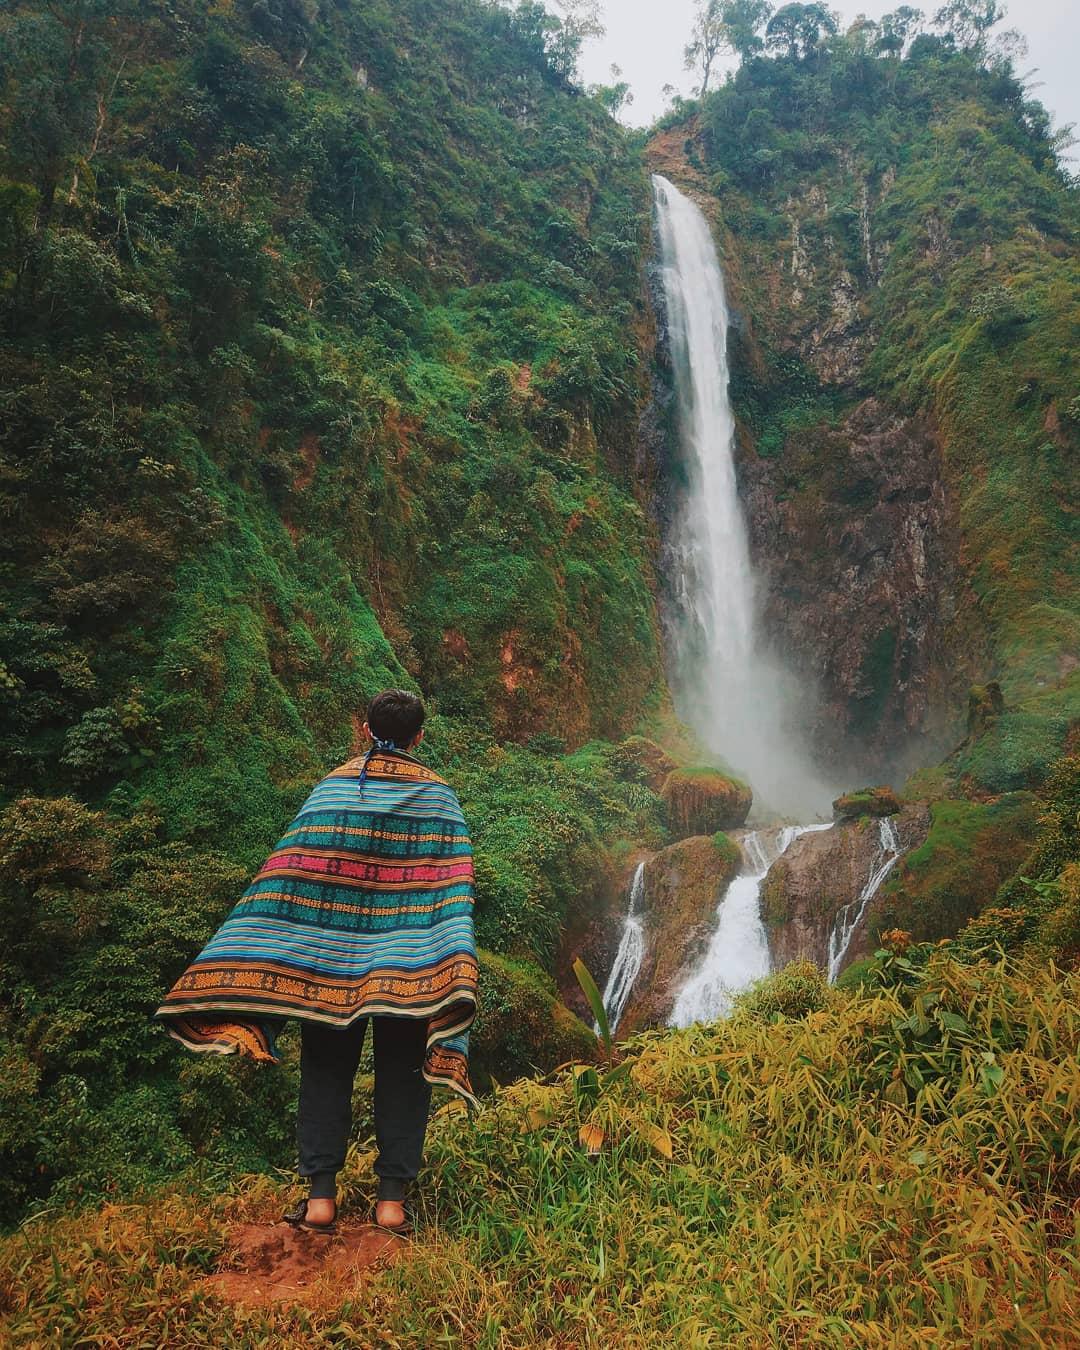 Lokasi Curug Citambur Jawa Barat Dan Harga Tiket Masuk